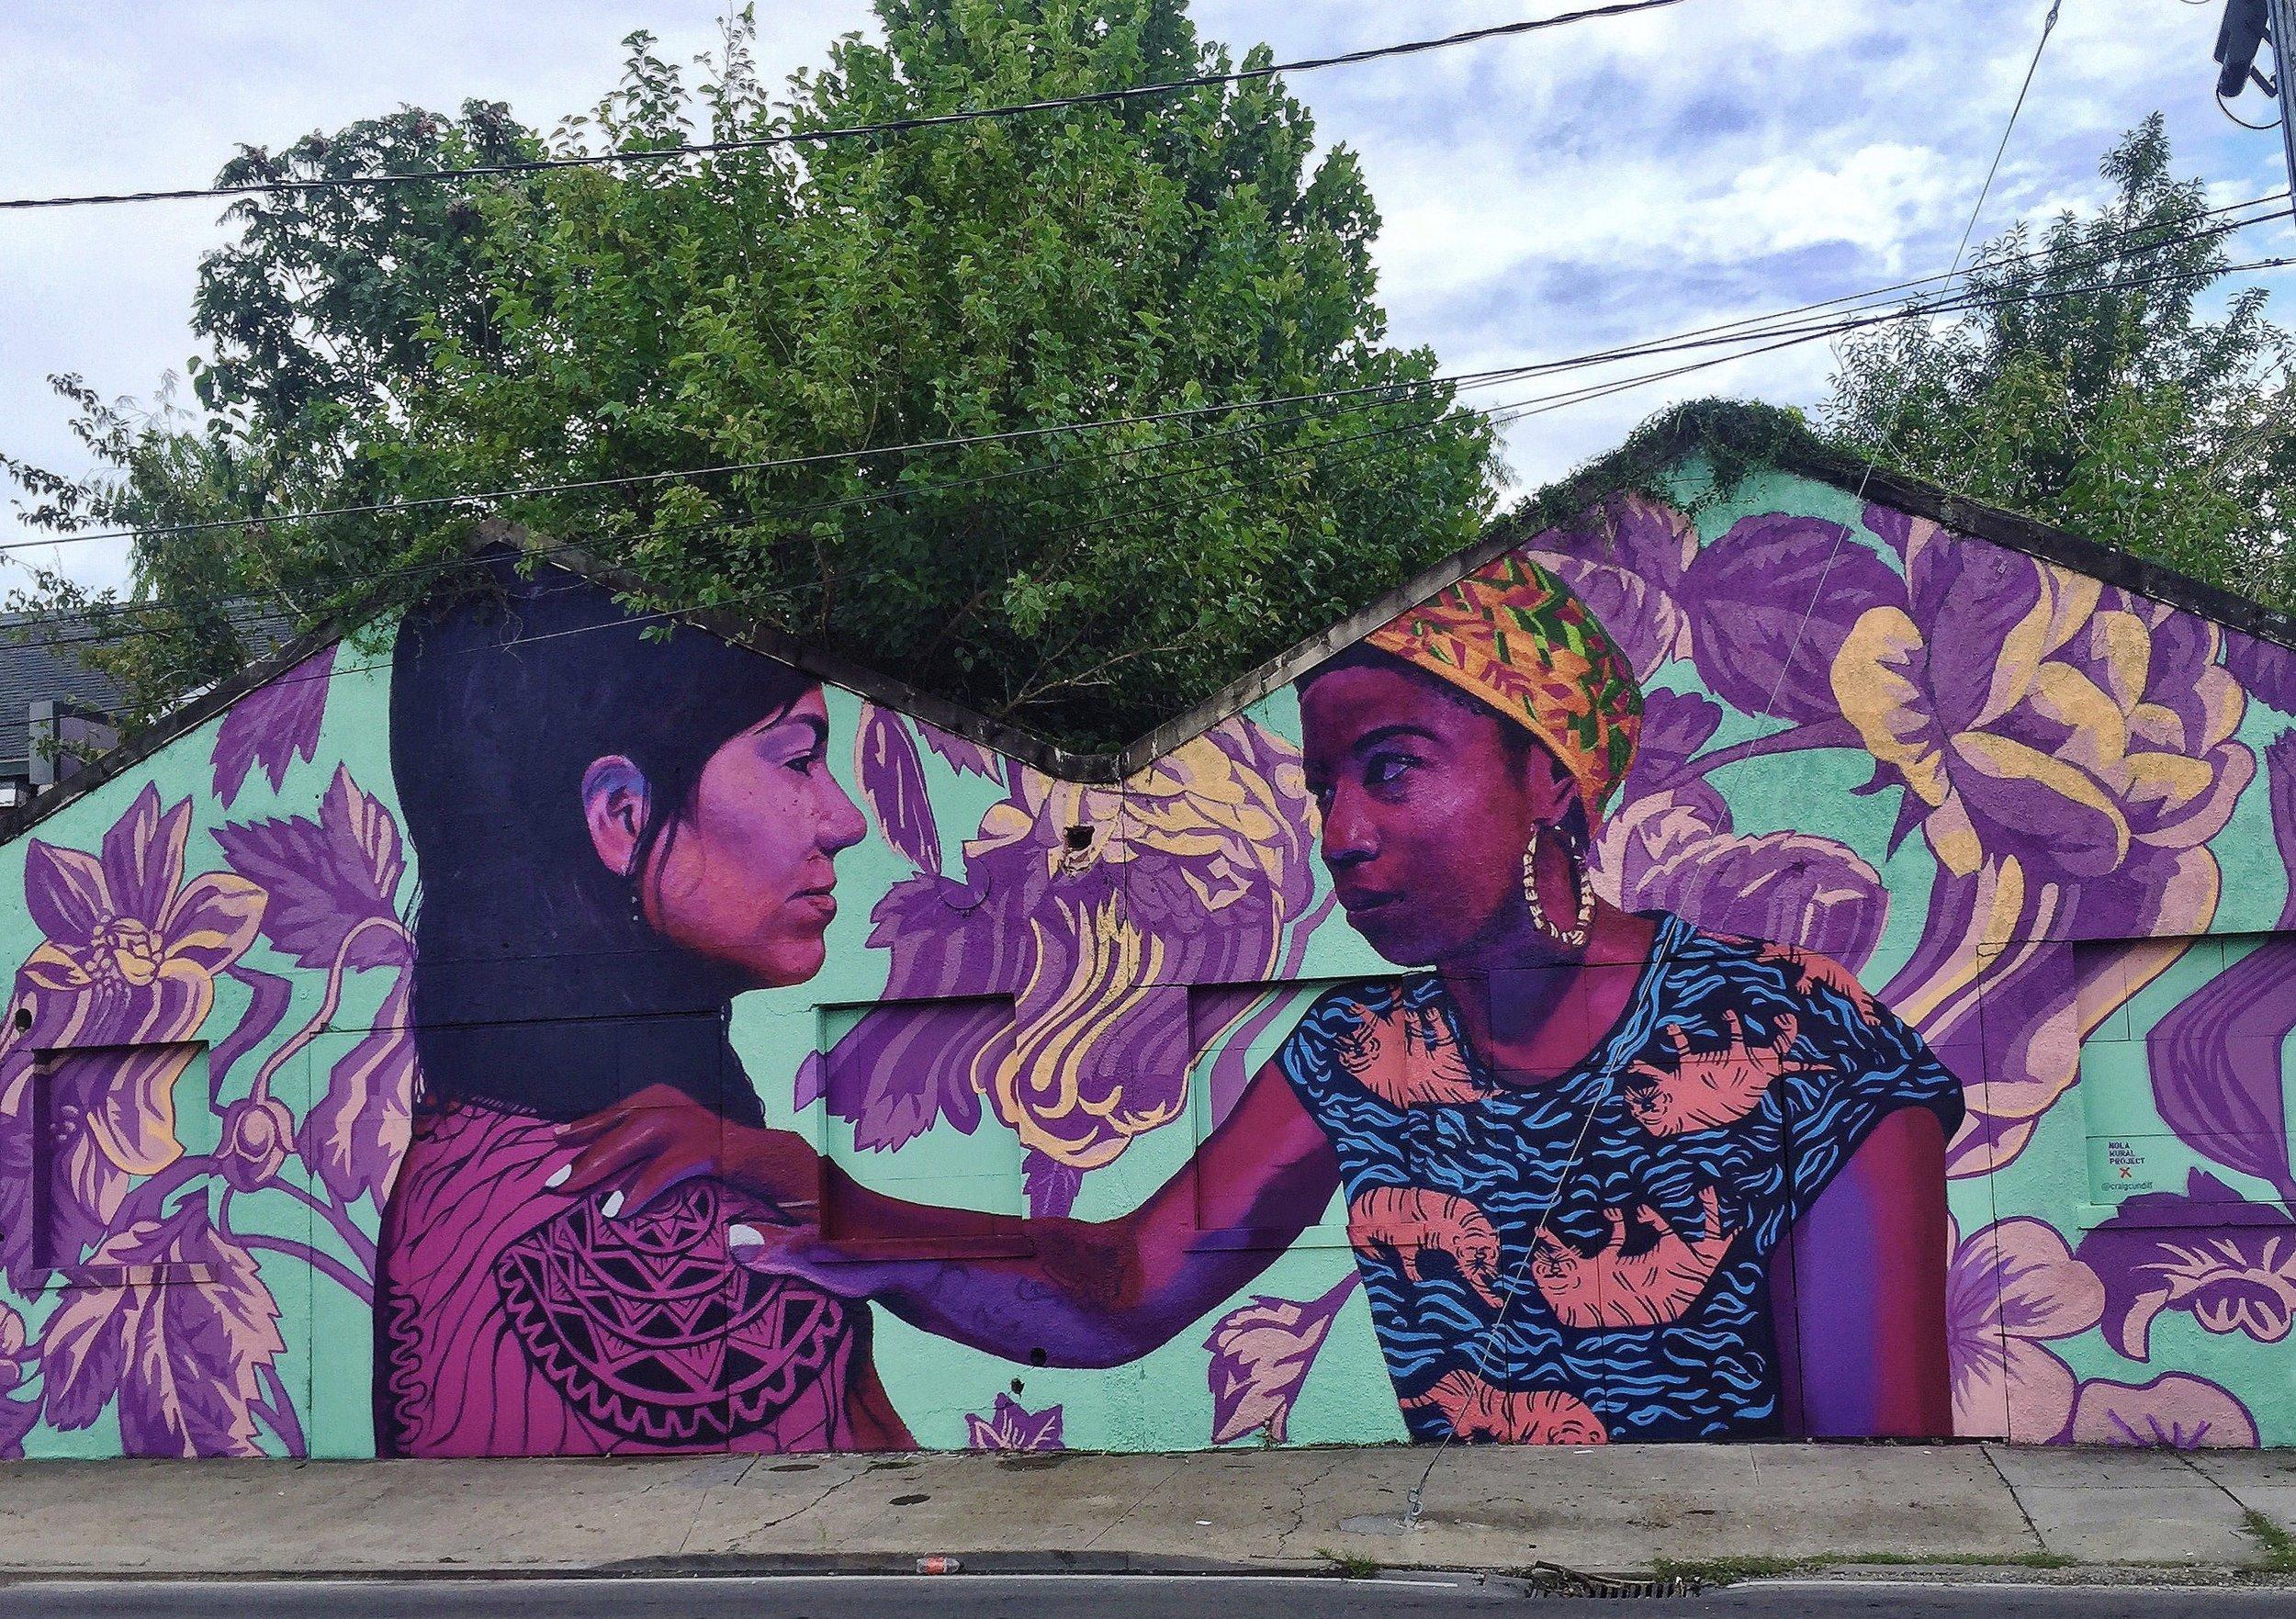 Mural by @craigcundiff, 2116 St. Claude Avenue